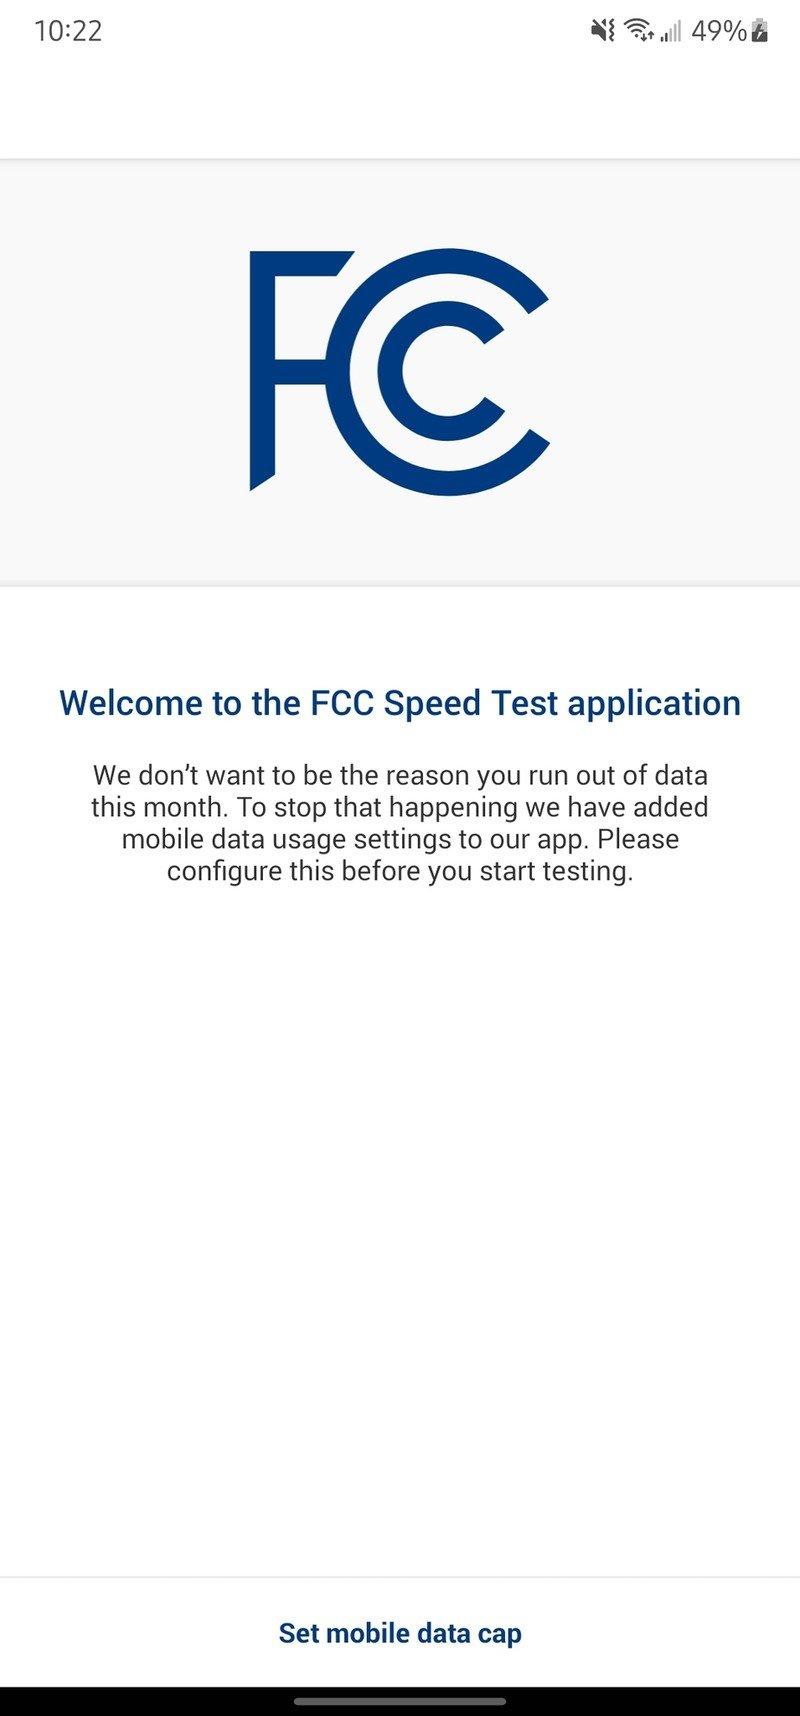 fcc-speed-test-app-1.jpg